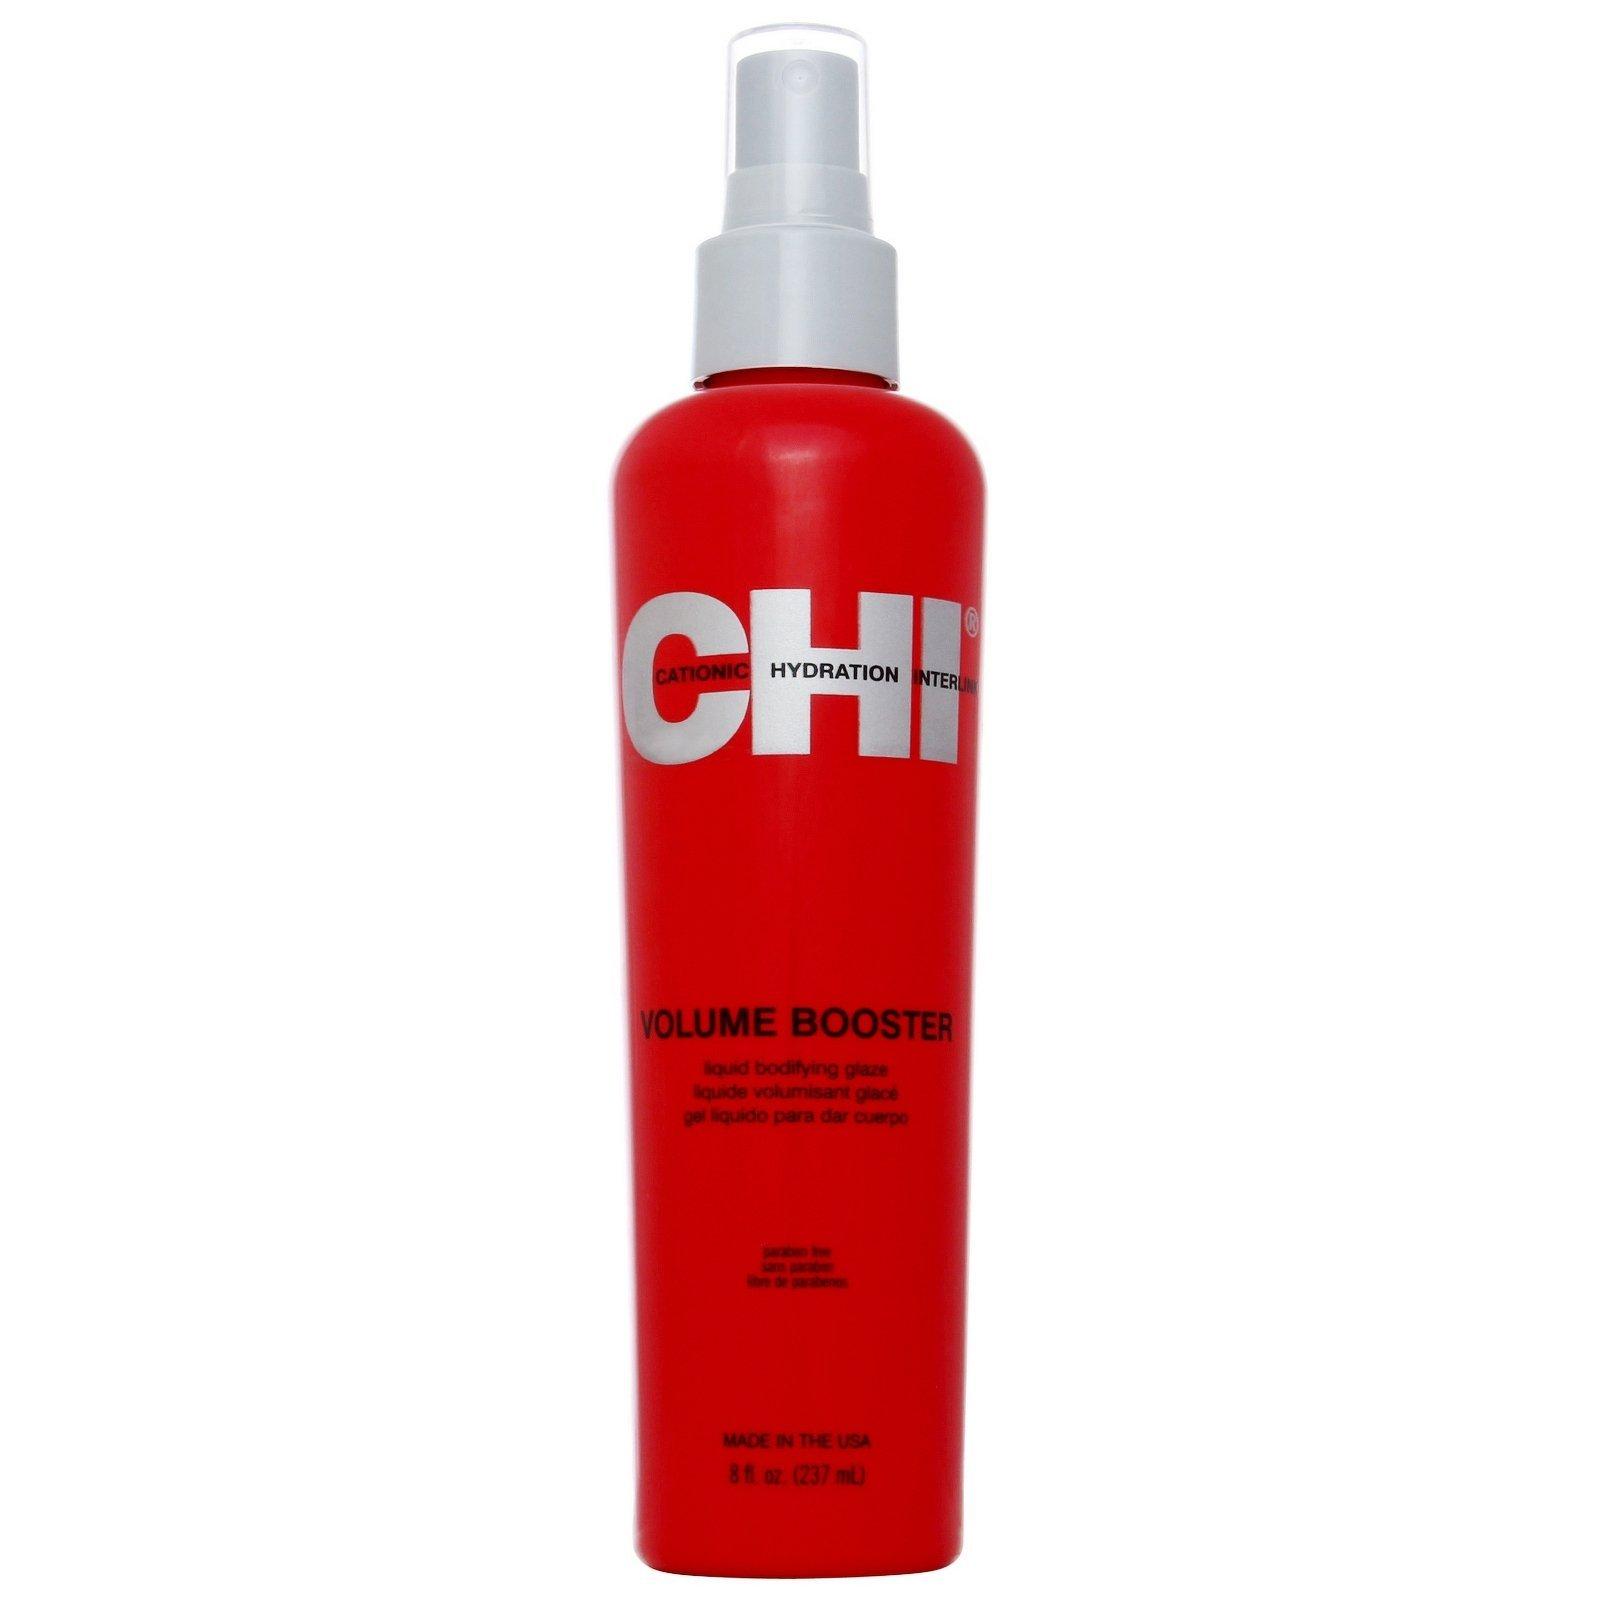 CHI Volume Booster Liquid Bodifying Glaze ,8 FL Oz by CHI